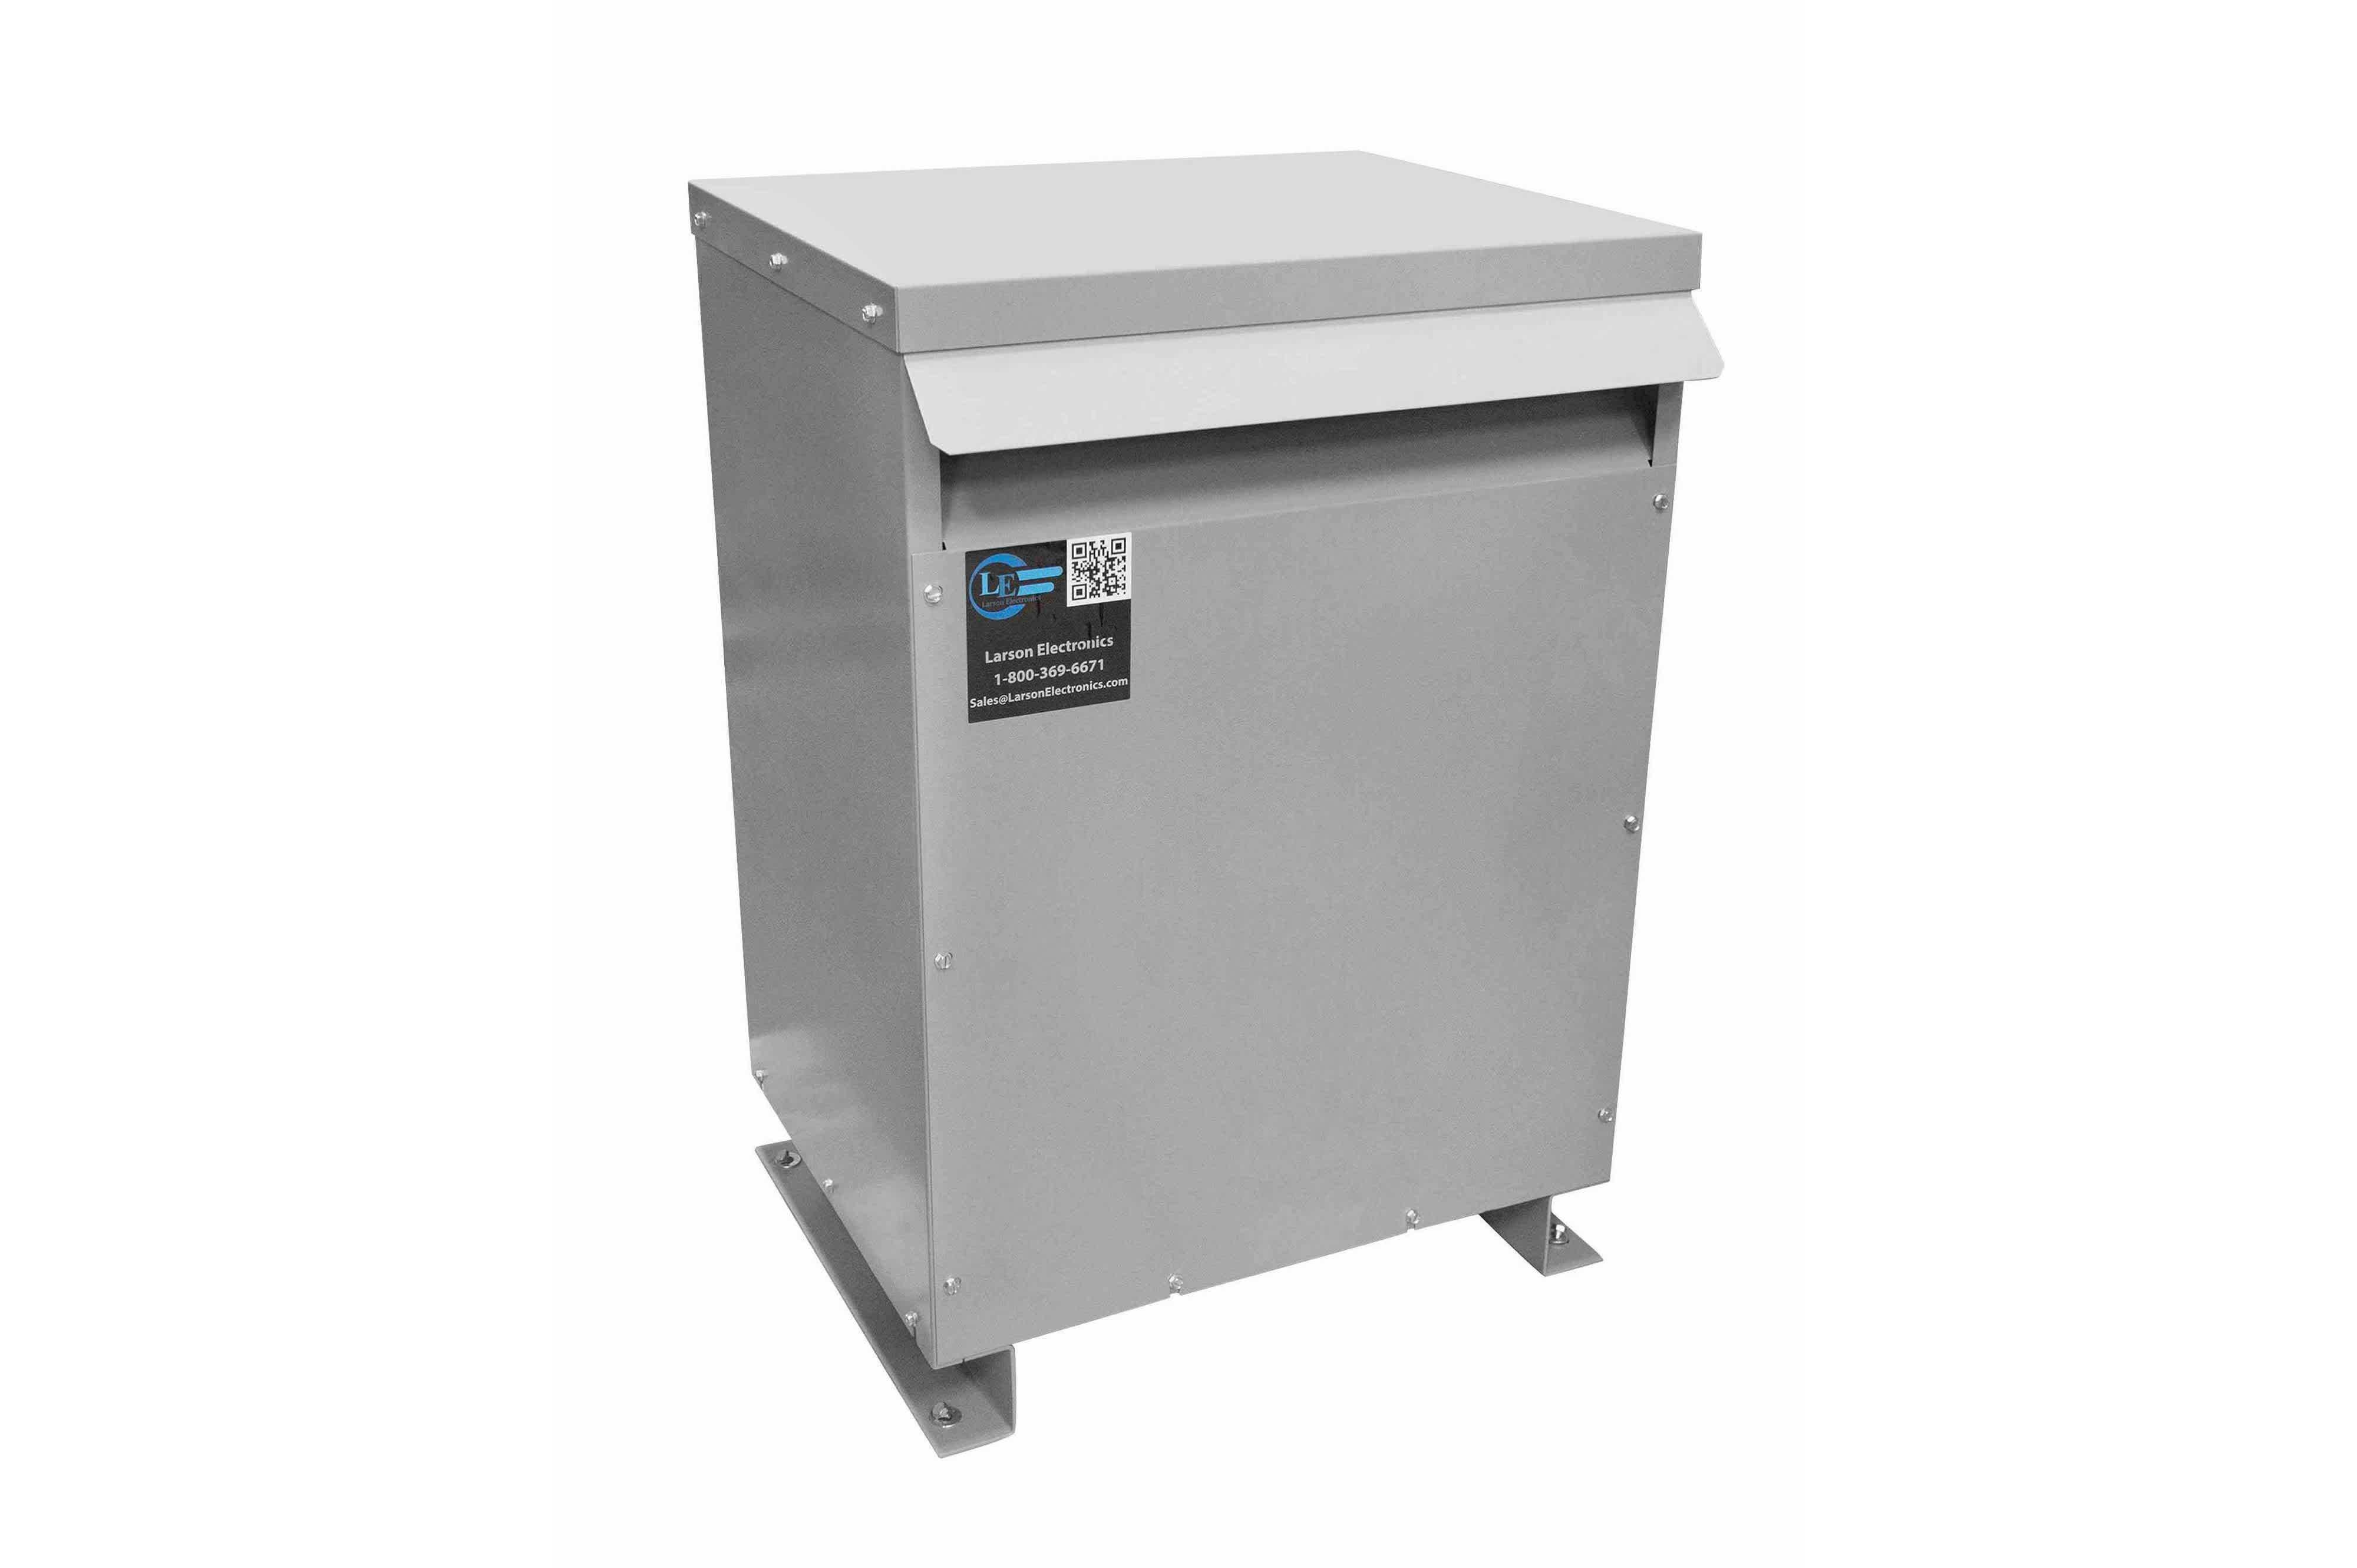 90 kVA 3PH Isolation Transformer, 600V Wye Primary, 480V Delta Secondary, N3R, Ventilated, 60 Hz